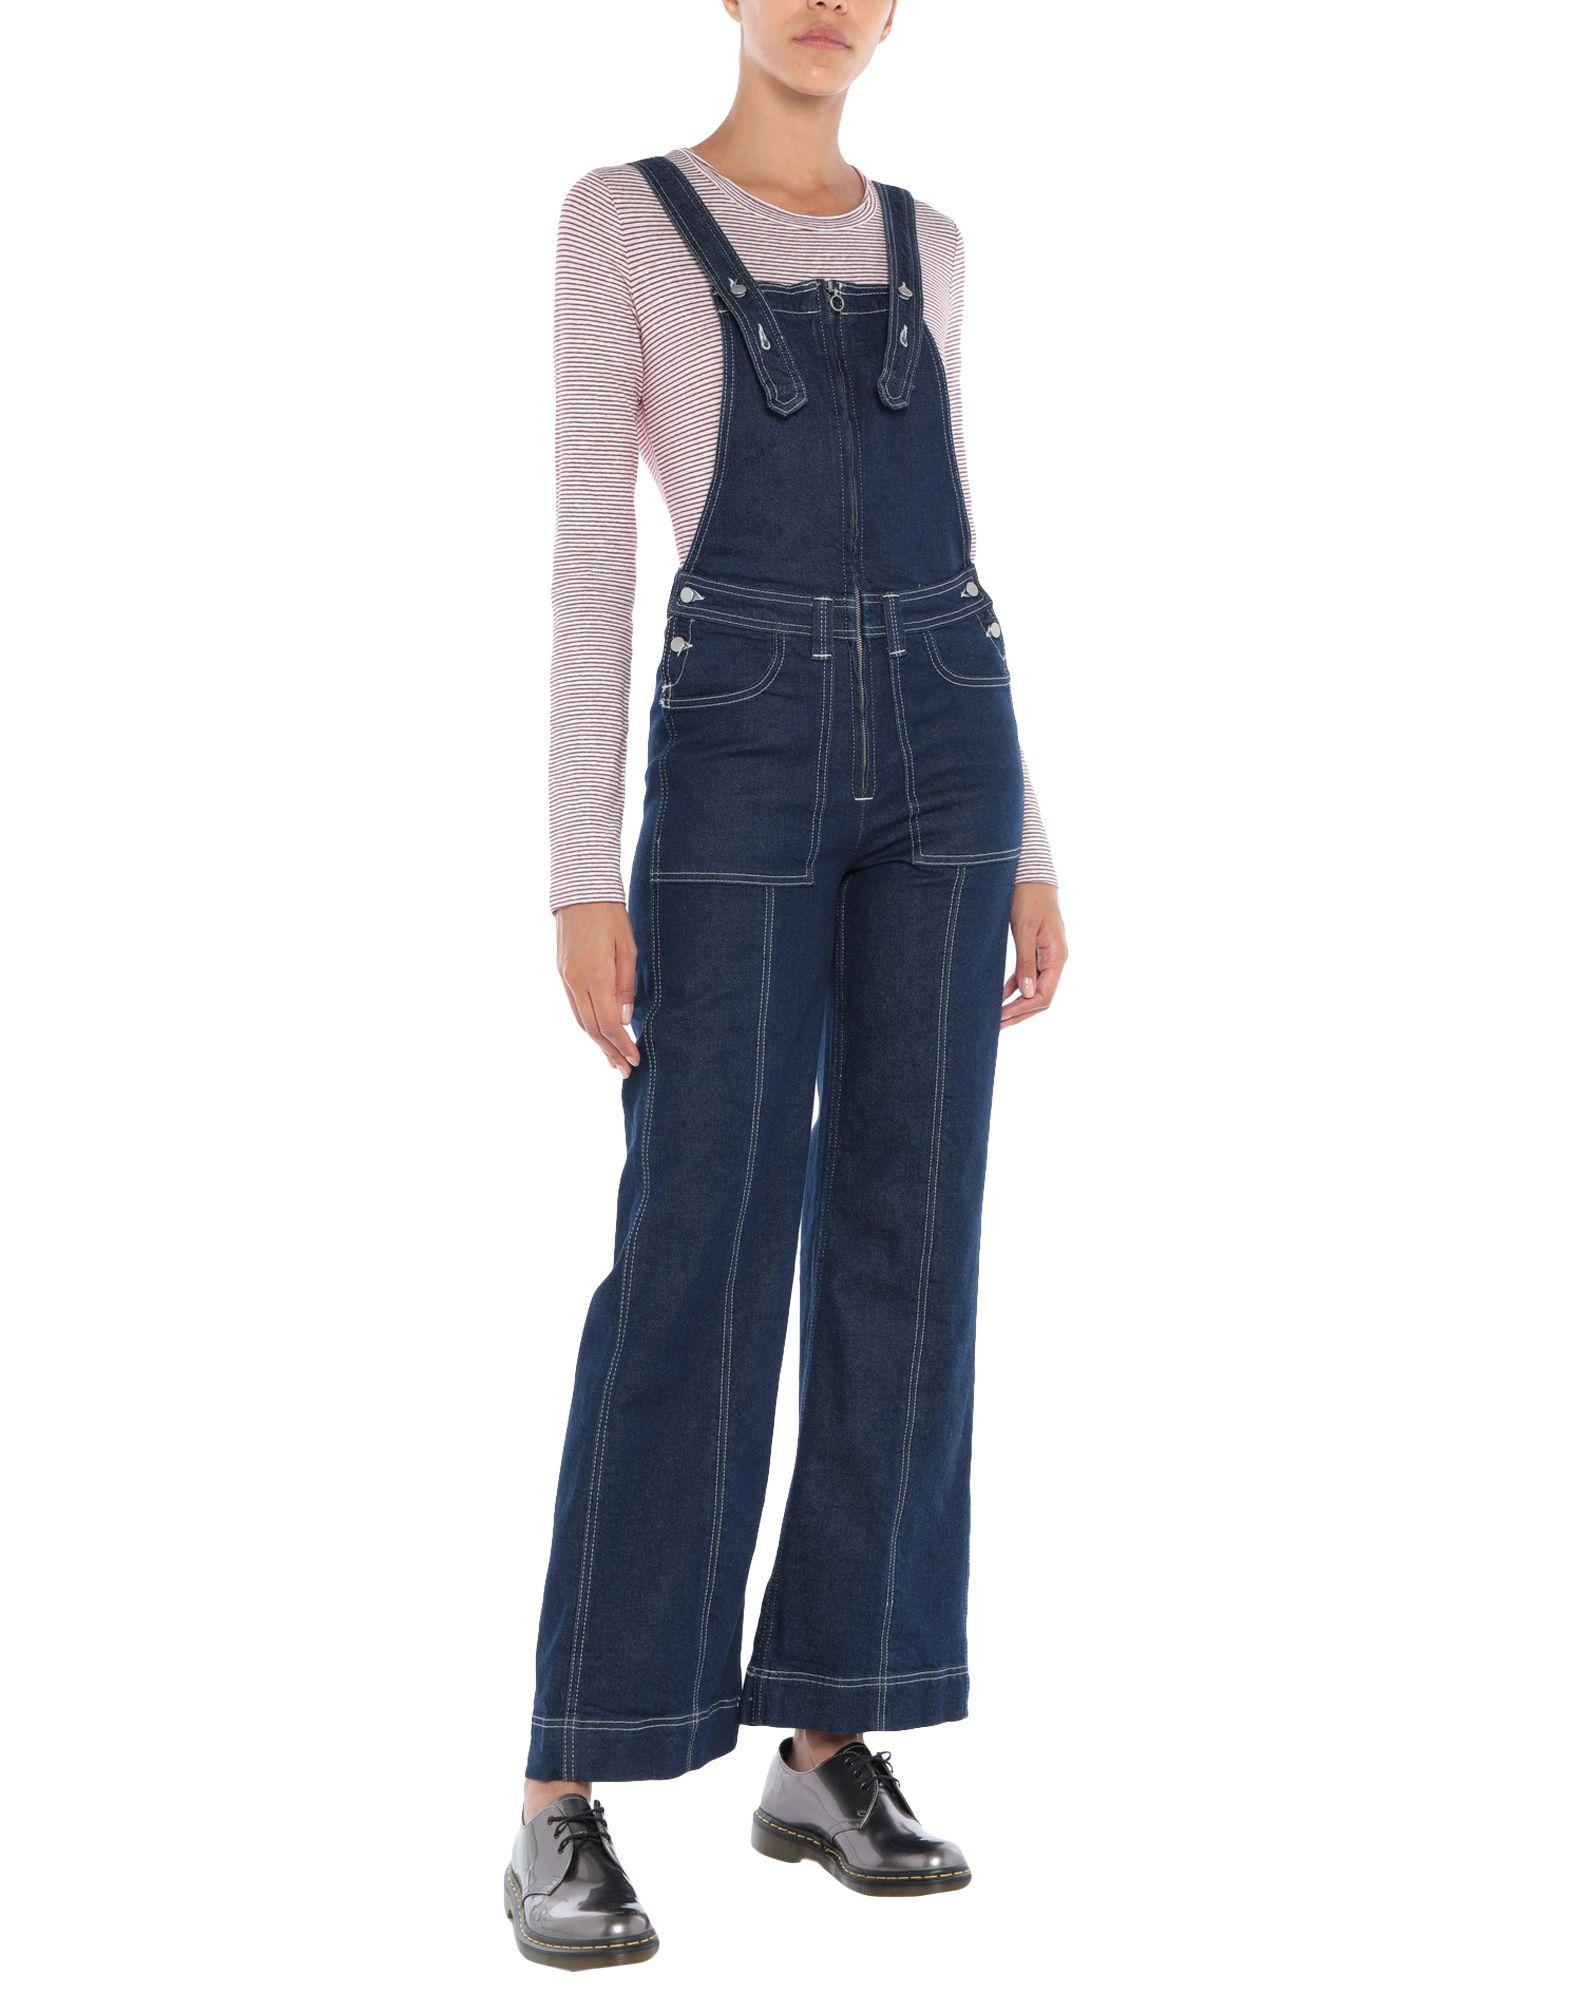 PEPE JEANS Брючный комбинезон tommy jeans брючный комбинезон